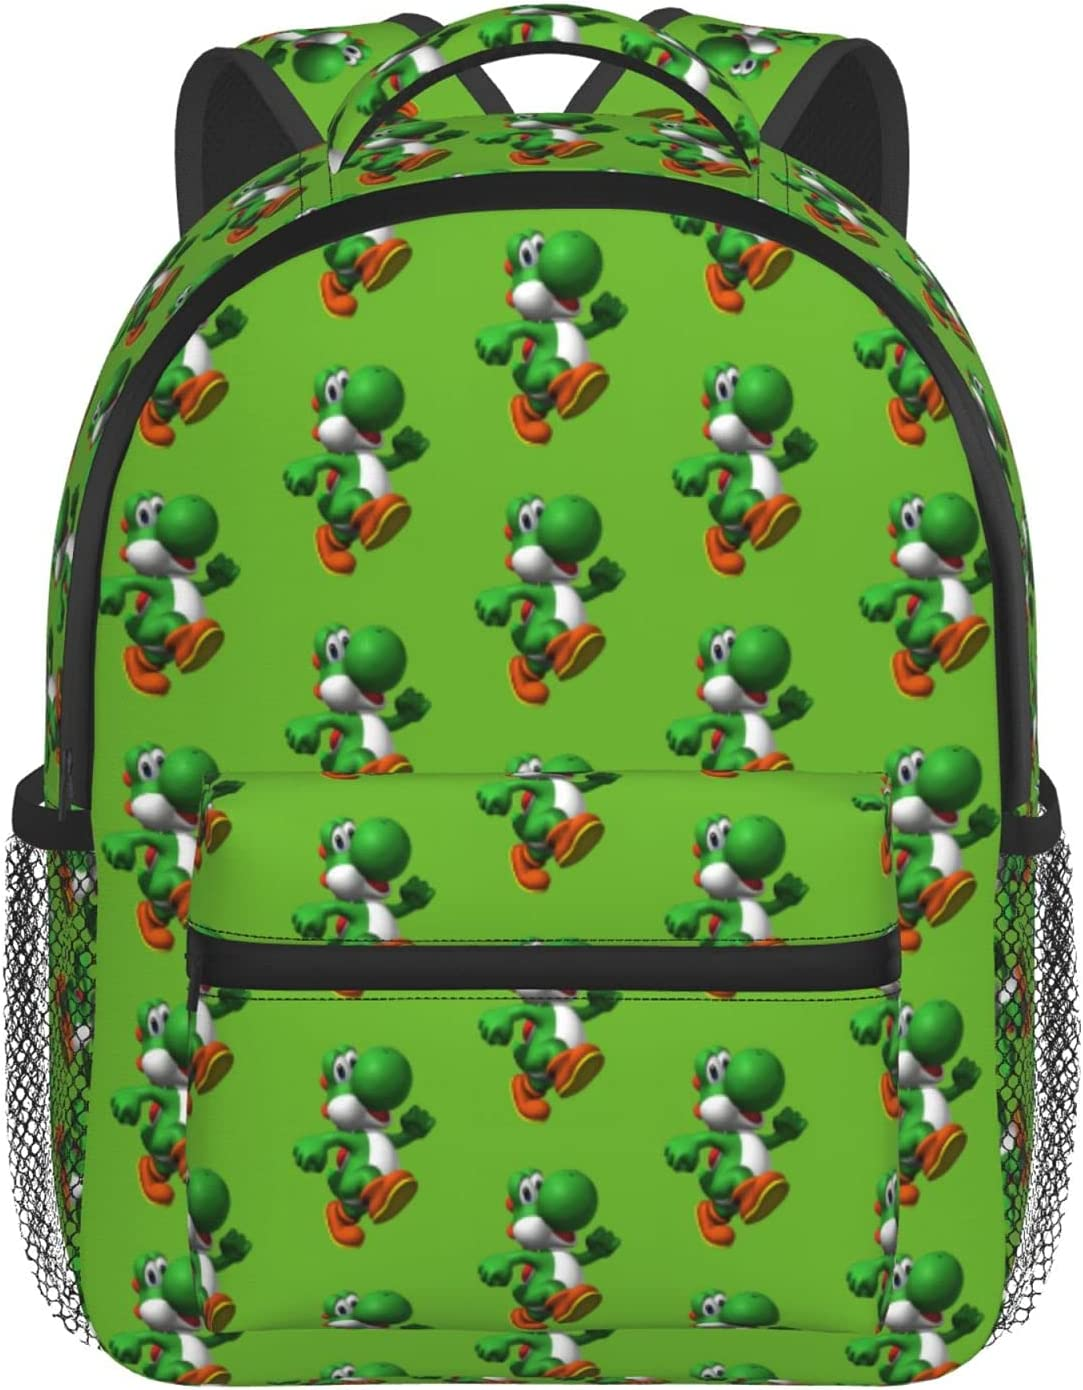 Yo-Shi Toddler Backpacks For Boys Preschool Tr Bookbag New popularity Girls Max 57% OFF And